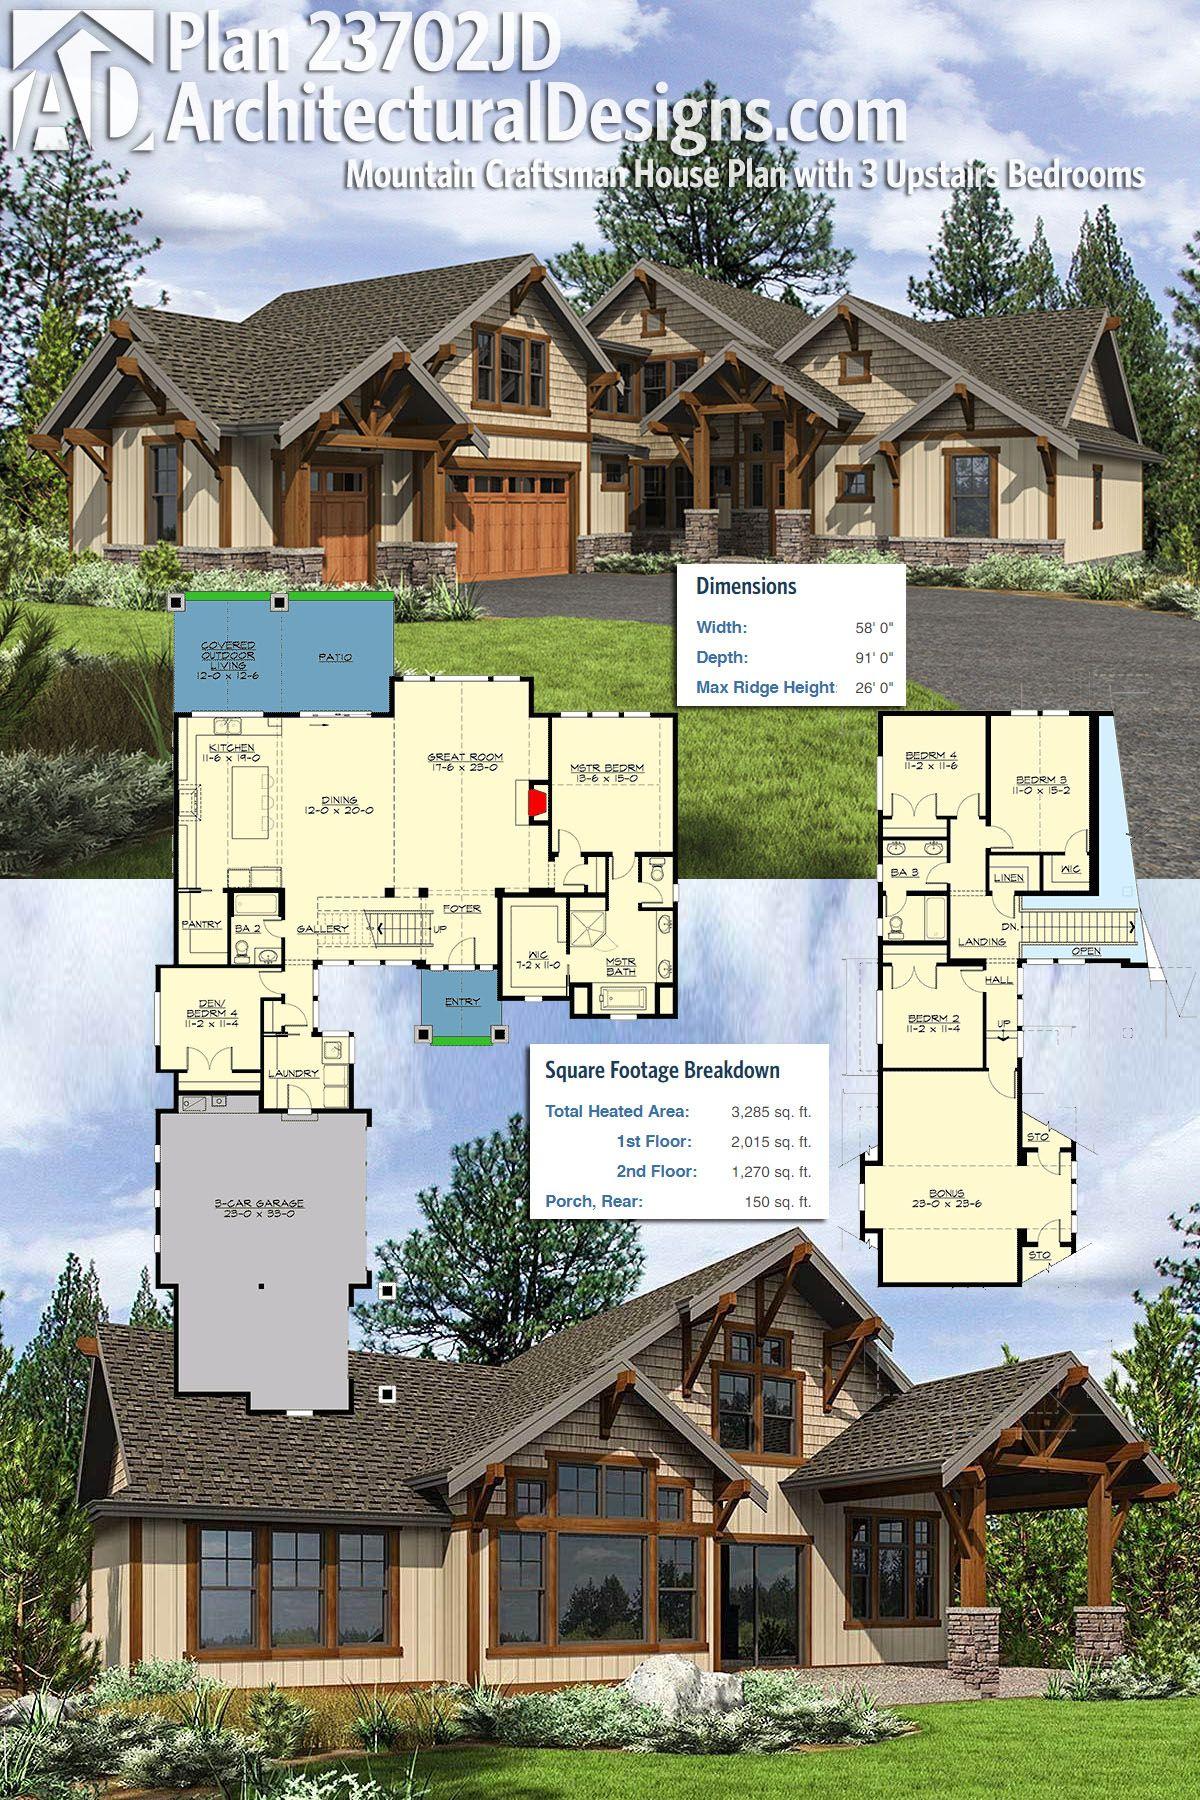 Plan 23702jd Mountain Craftsman House With 3